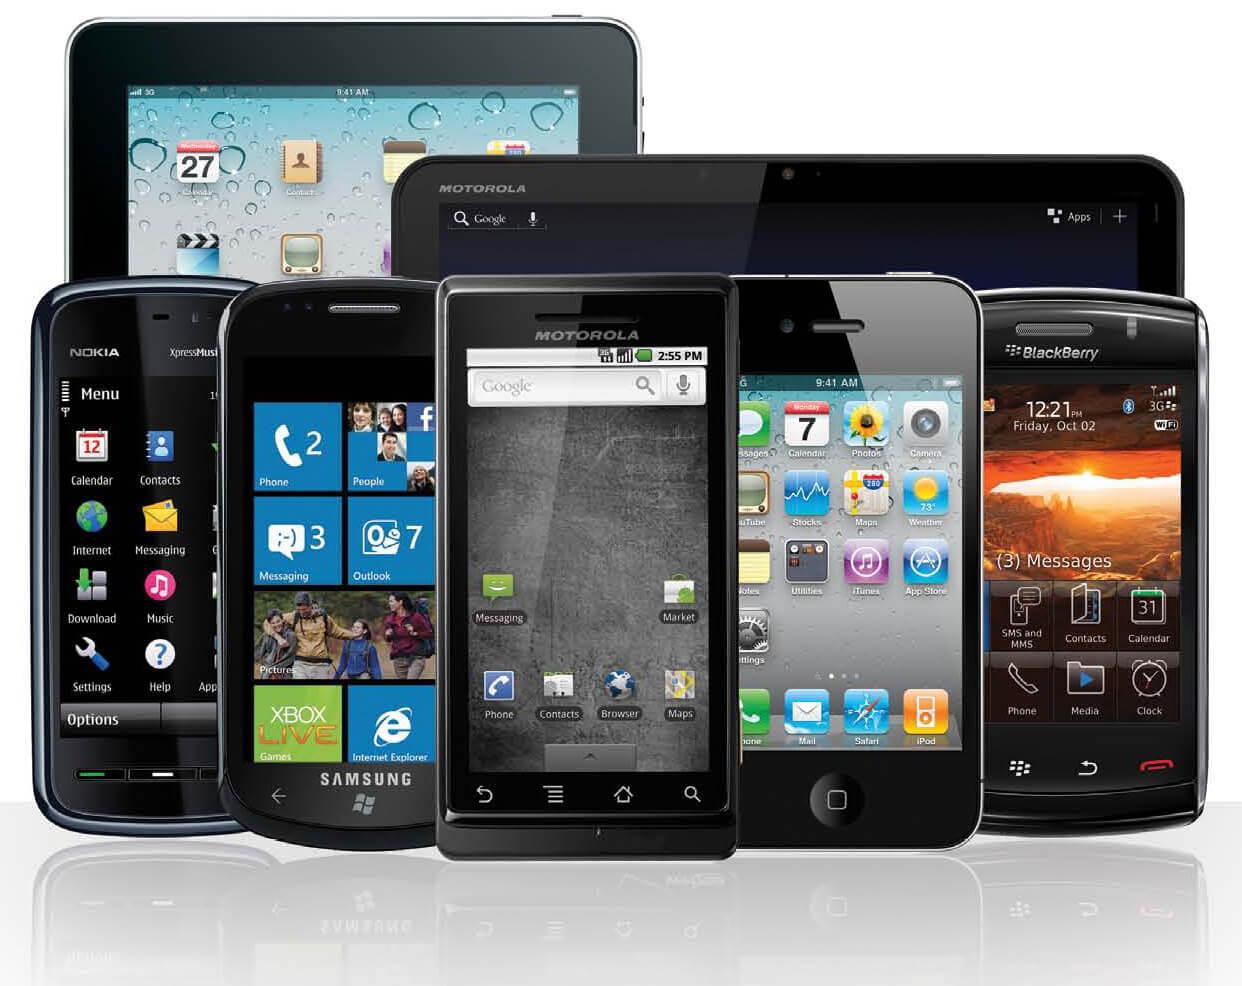 Aumento de uso mobile no Brasil